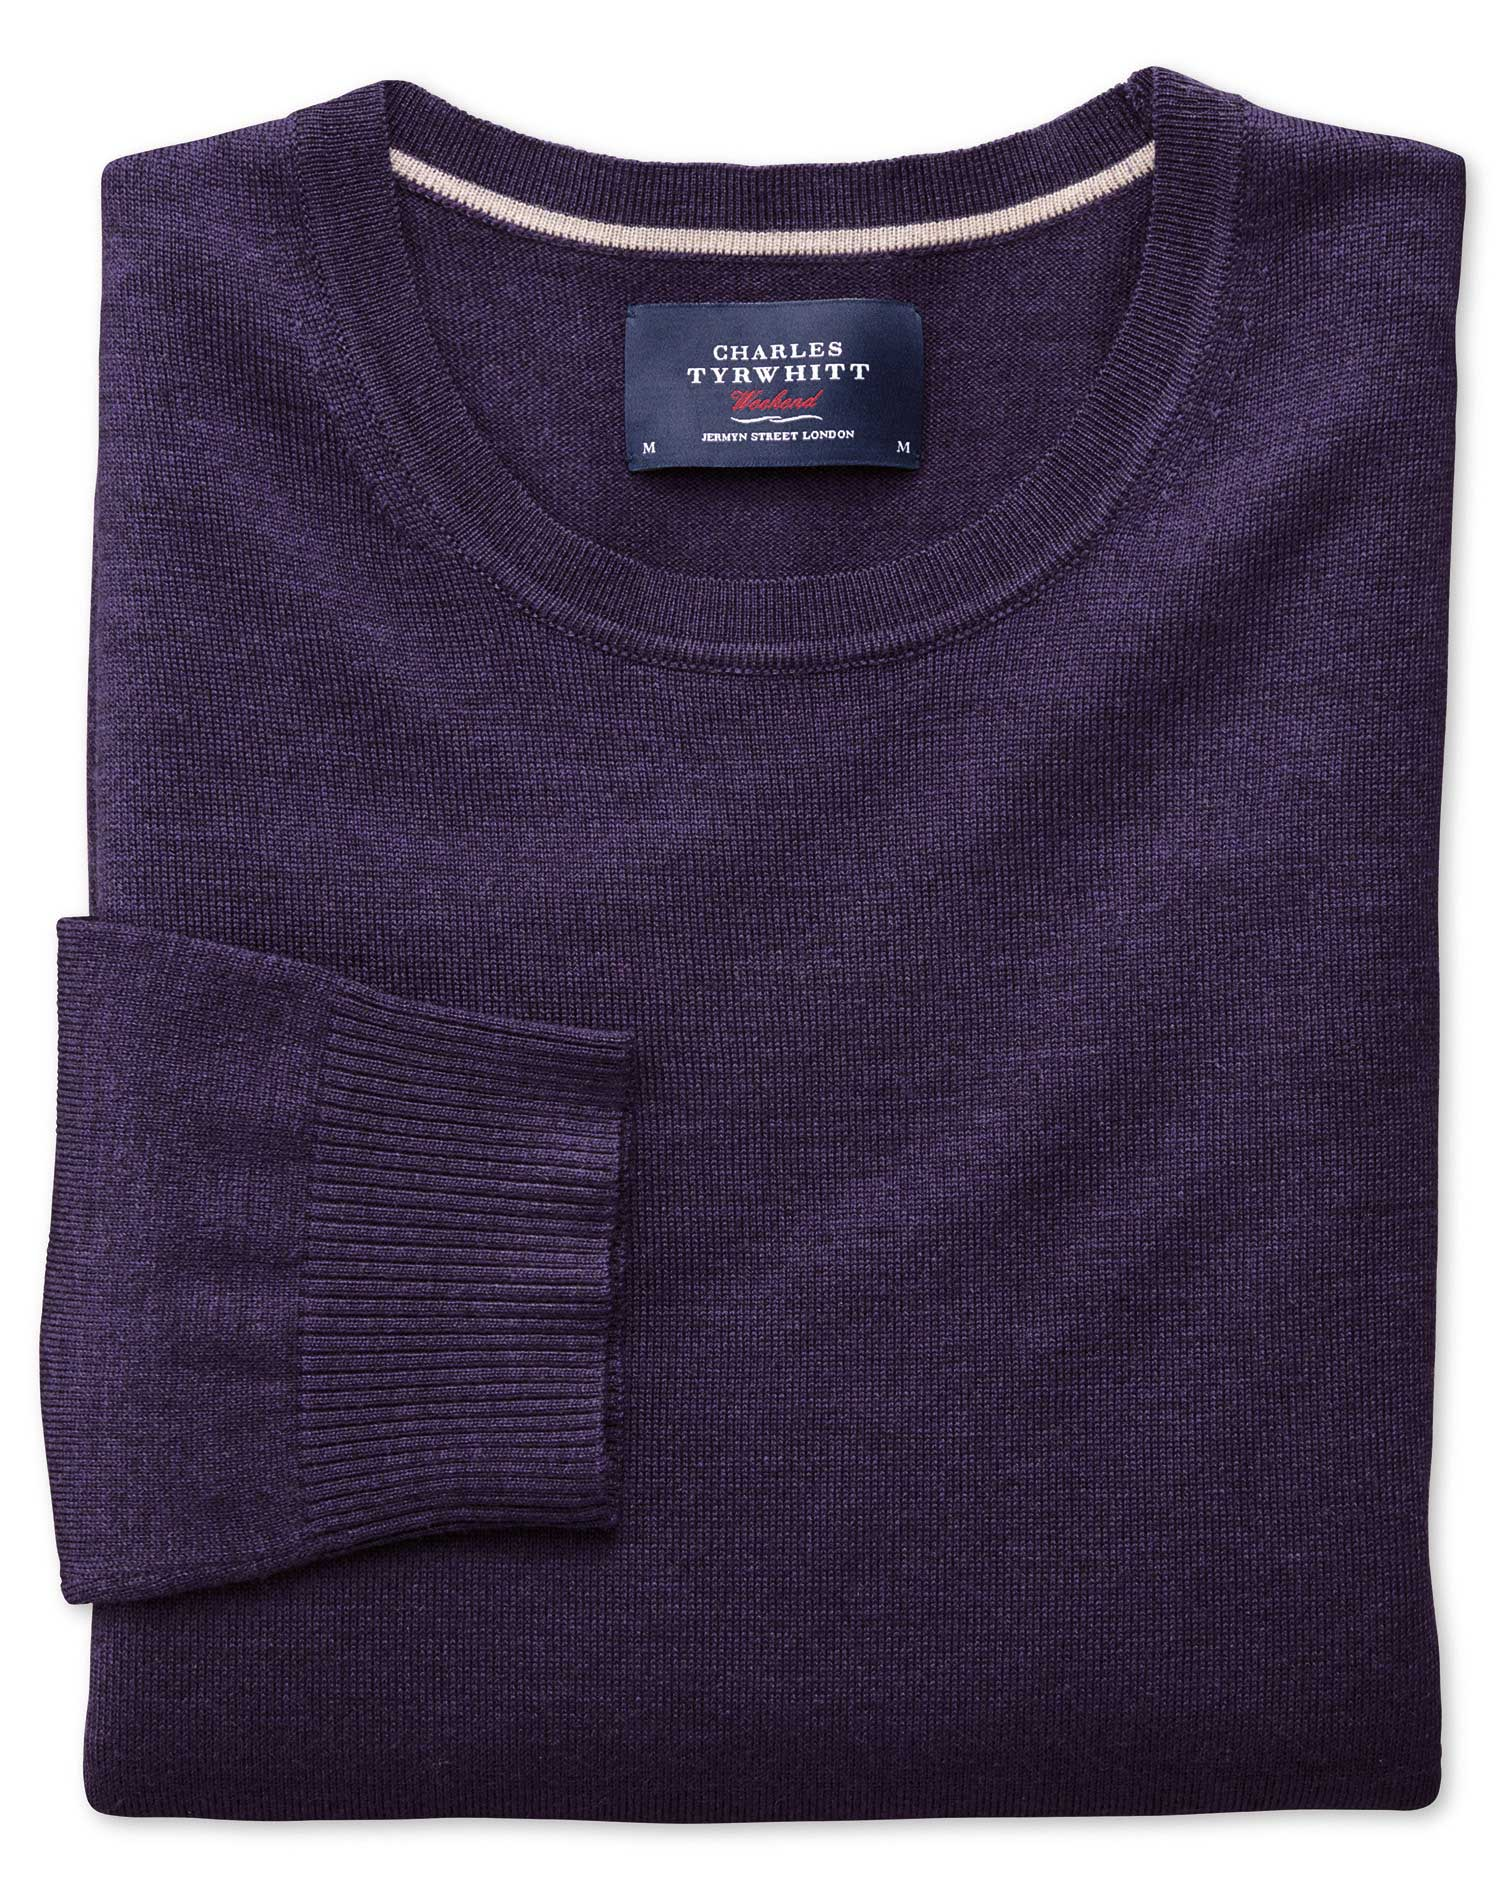 Purple Merino Wool Crew Neck Jumper Size XL by Charles Tyrwhitt